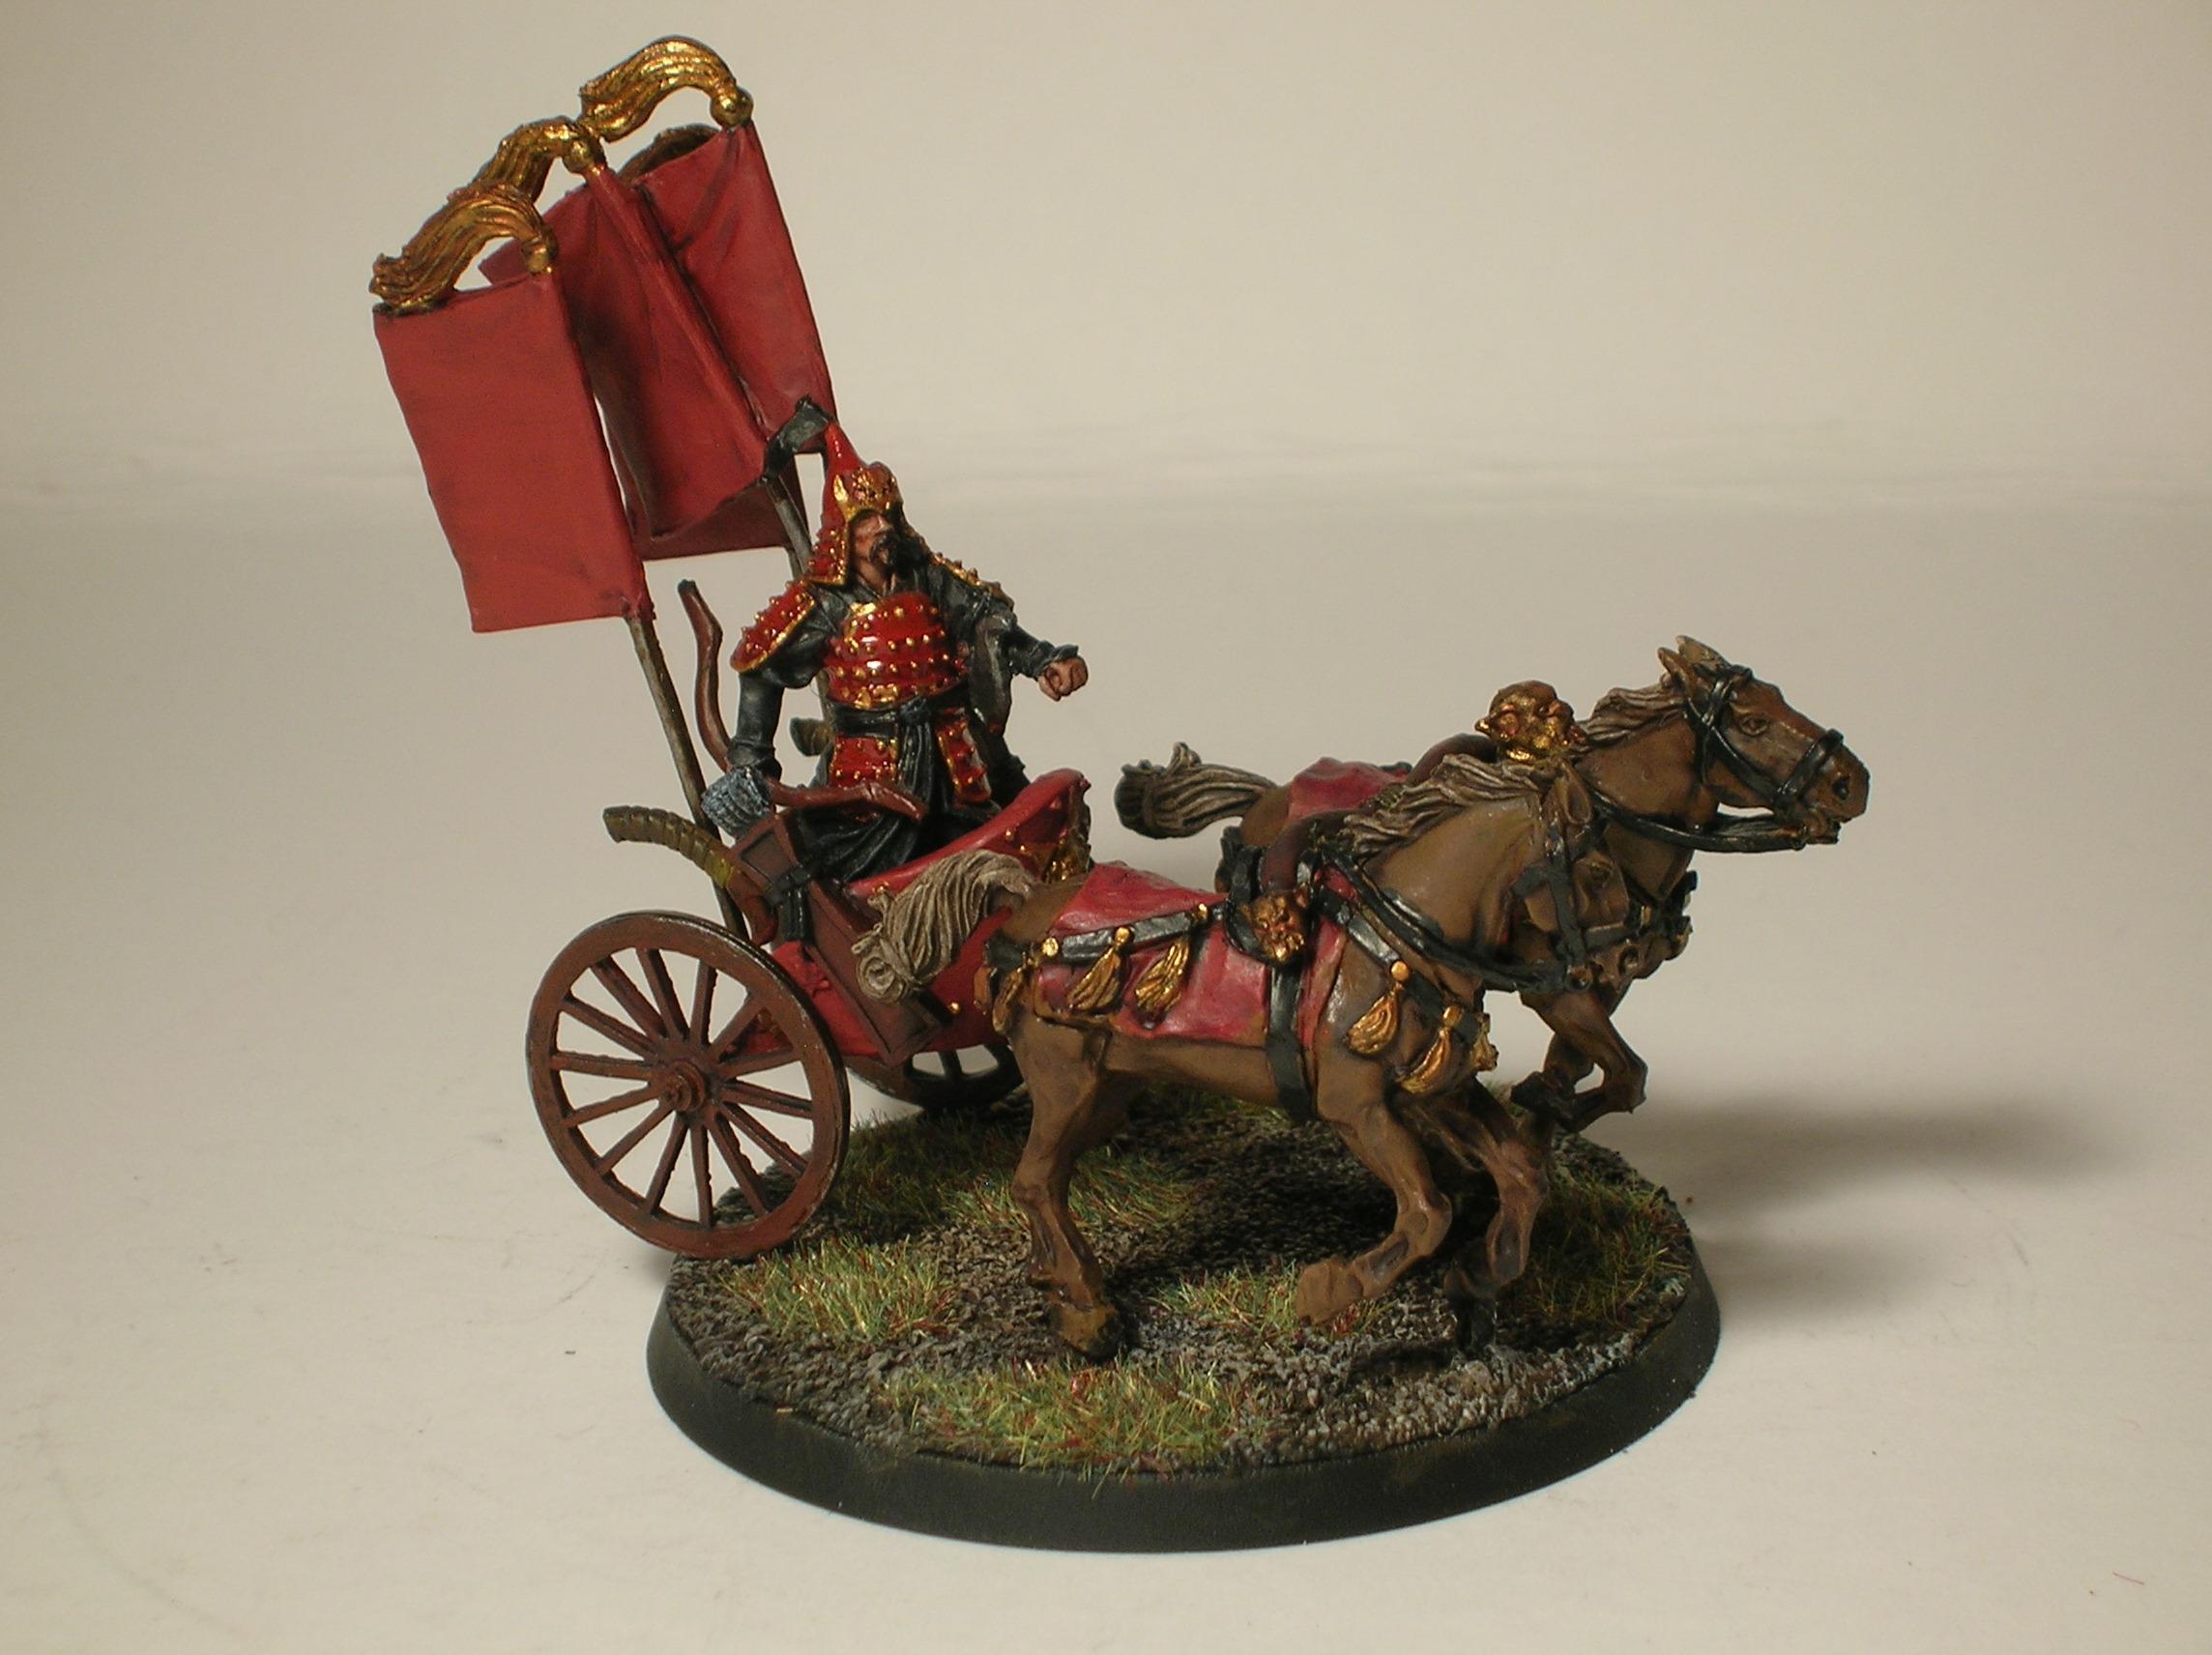 Chariot, Khandesh, Khandesh King in Chariot